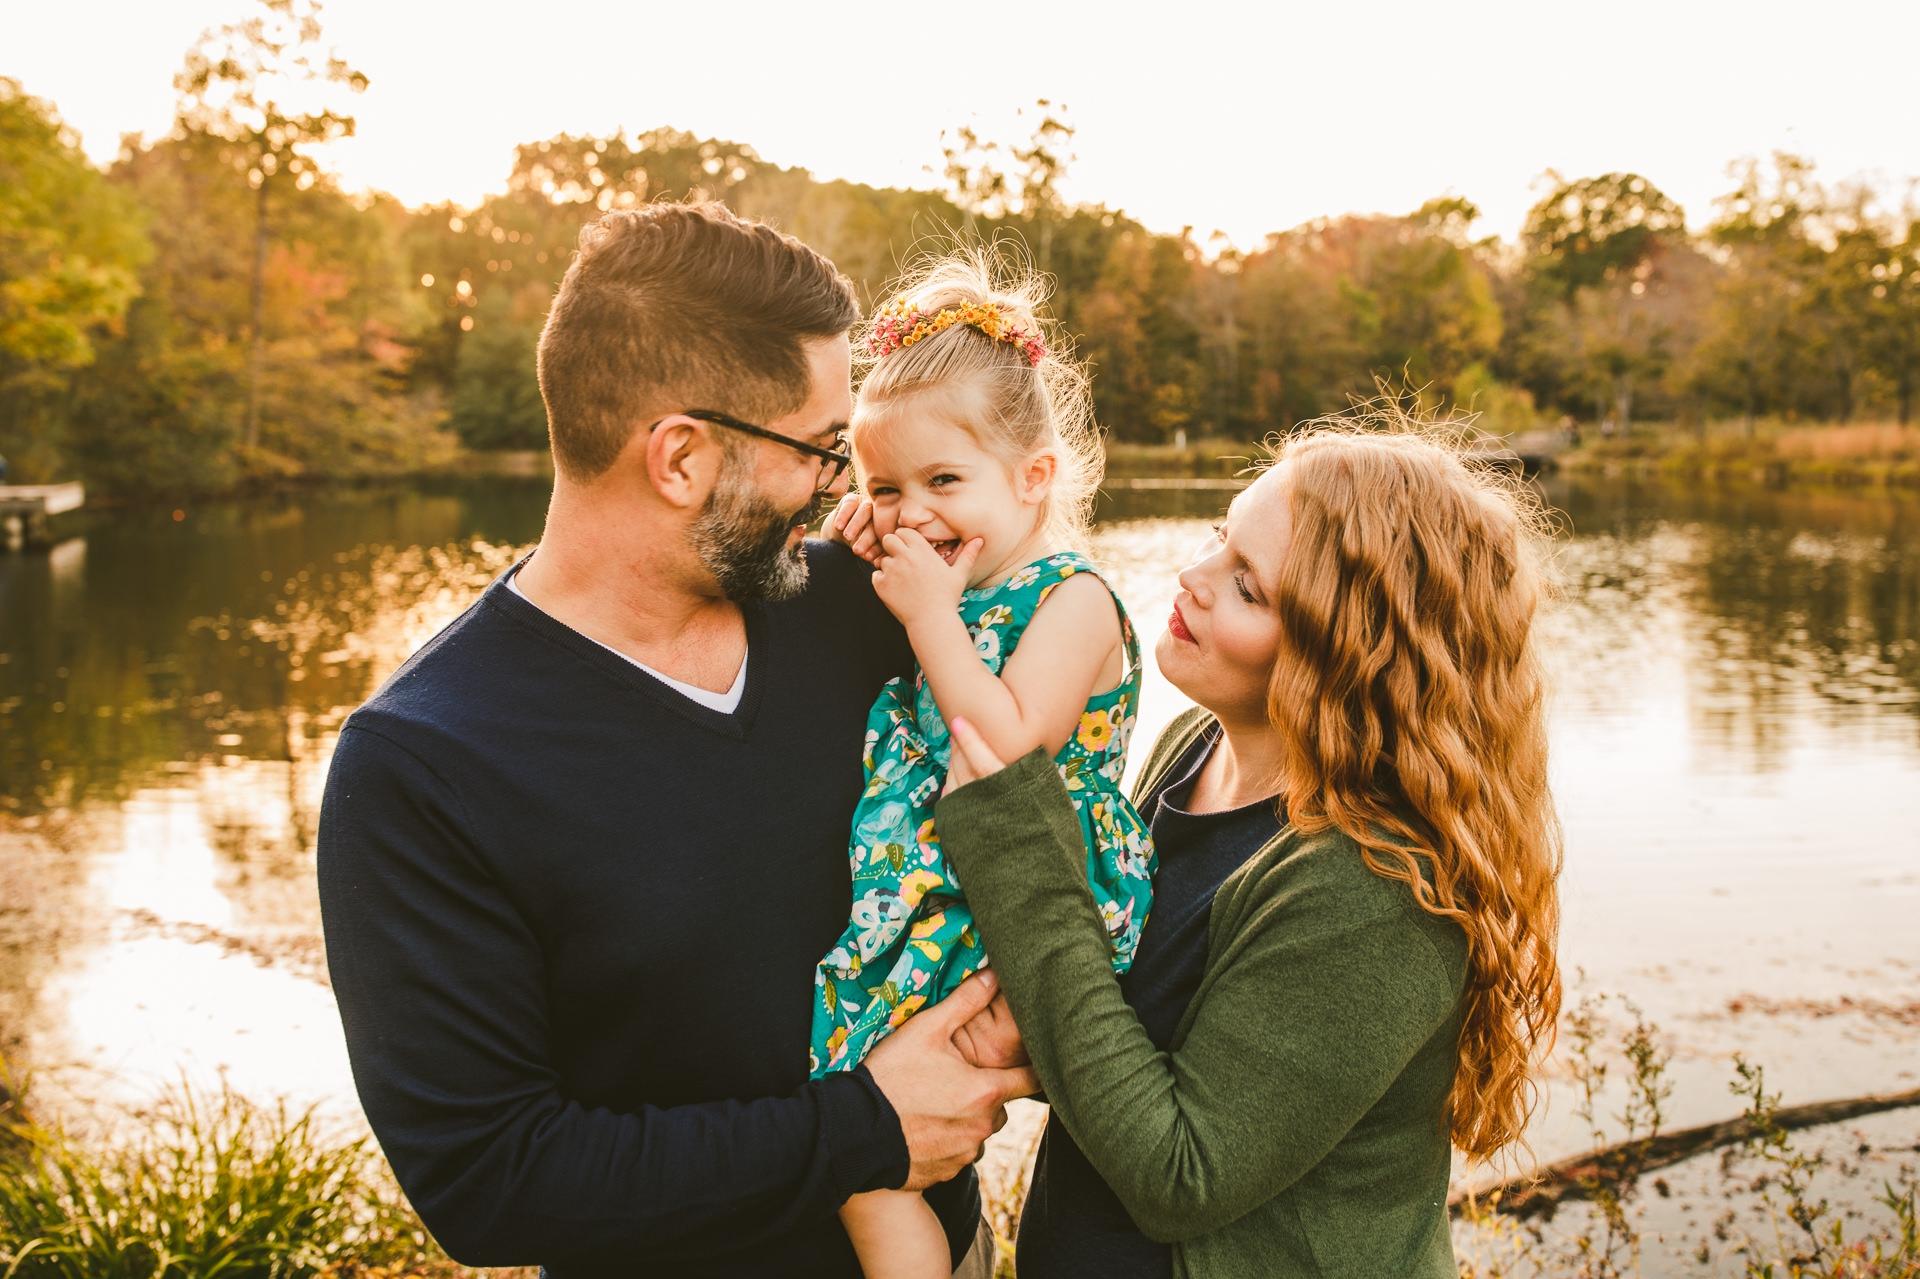 Lakewood Family Fall Portrait Photographer 19.jpg